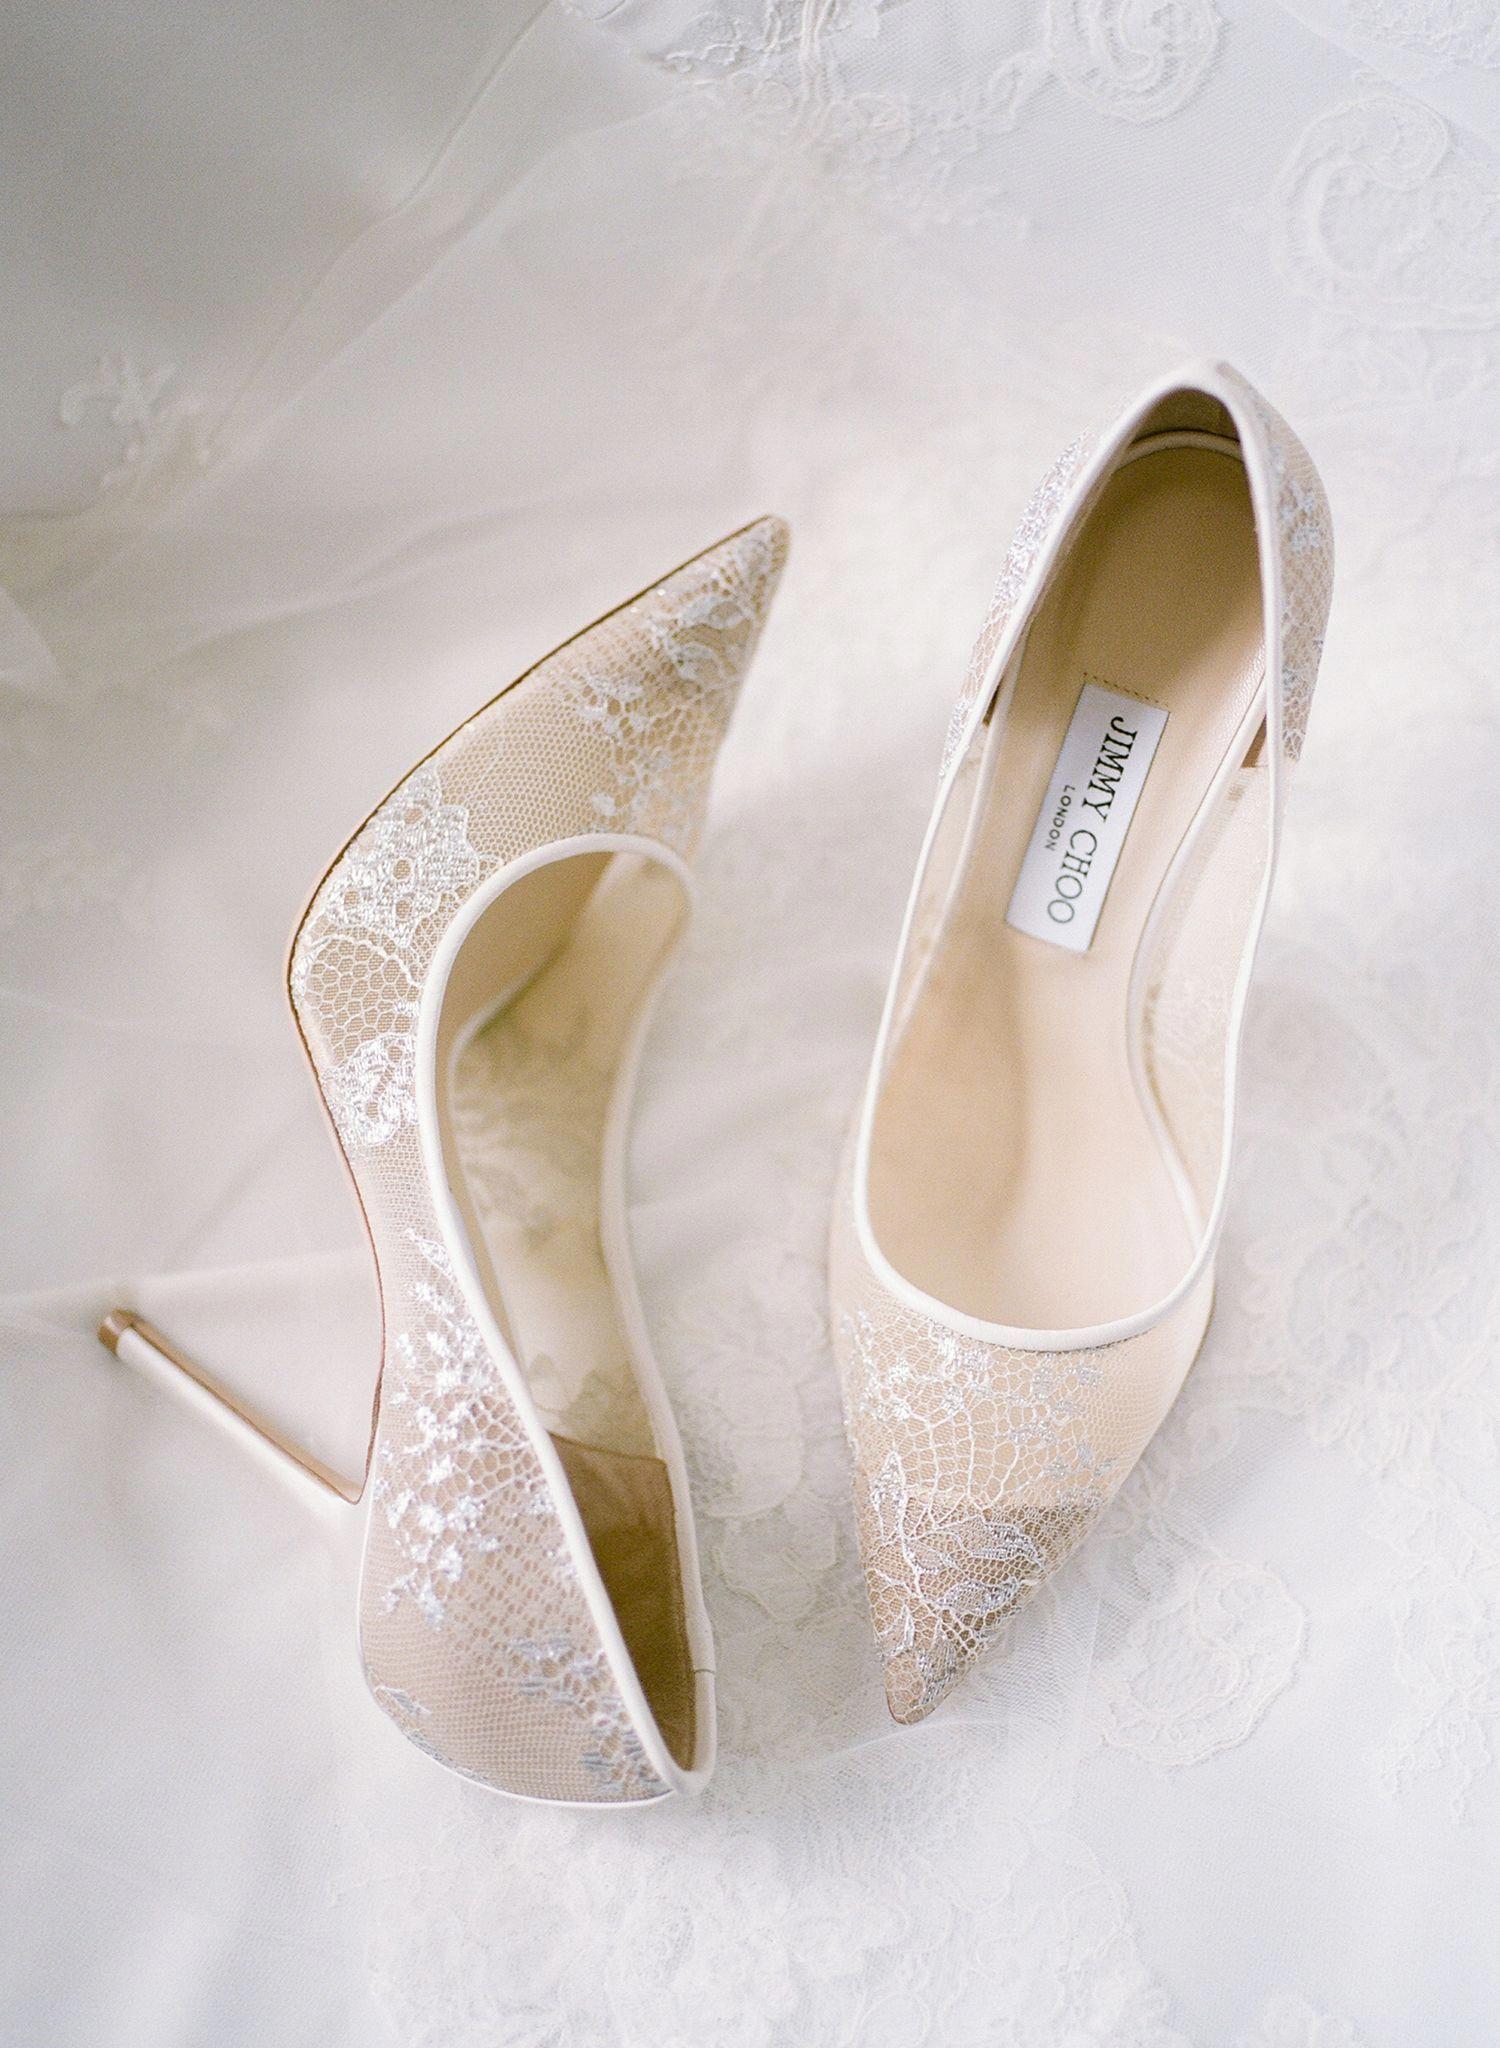 19 Fantastic Wedding Shoes No Heel In 2020 Jimmy Choo Wedding Shoes Bride Shoes Bridal Shoes